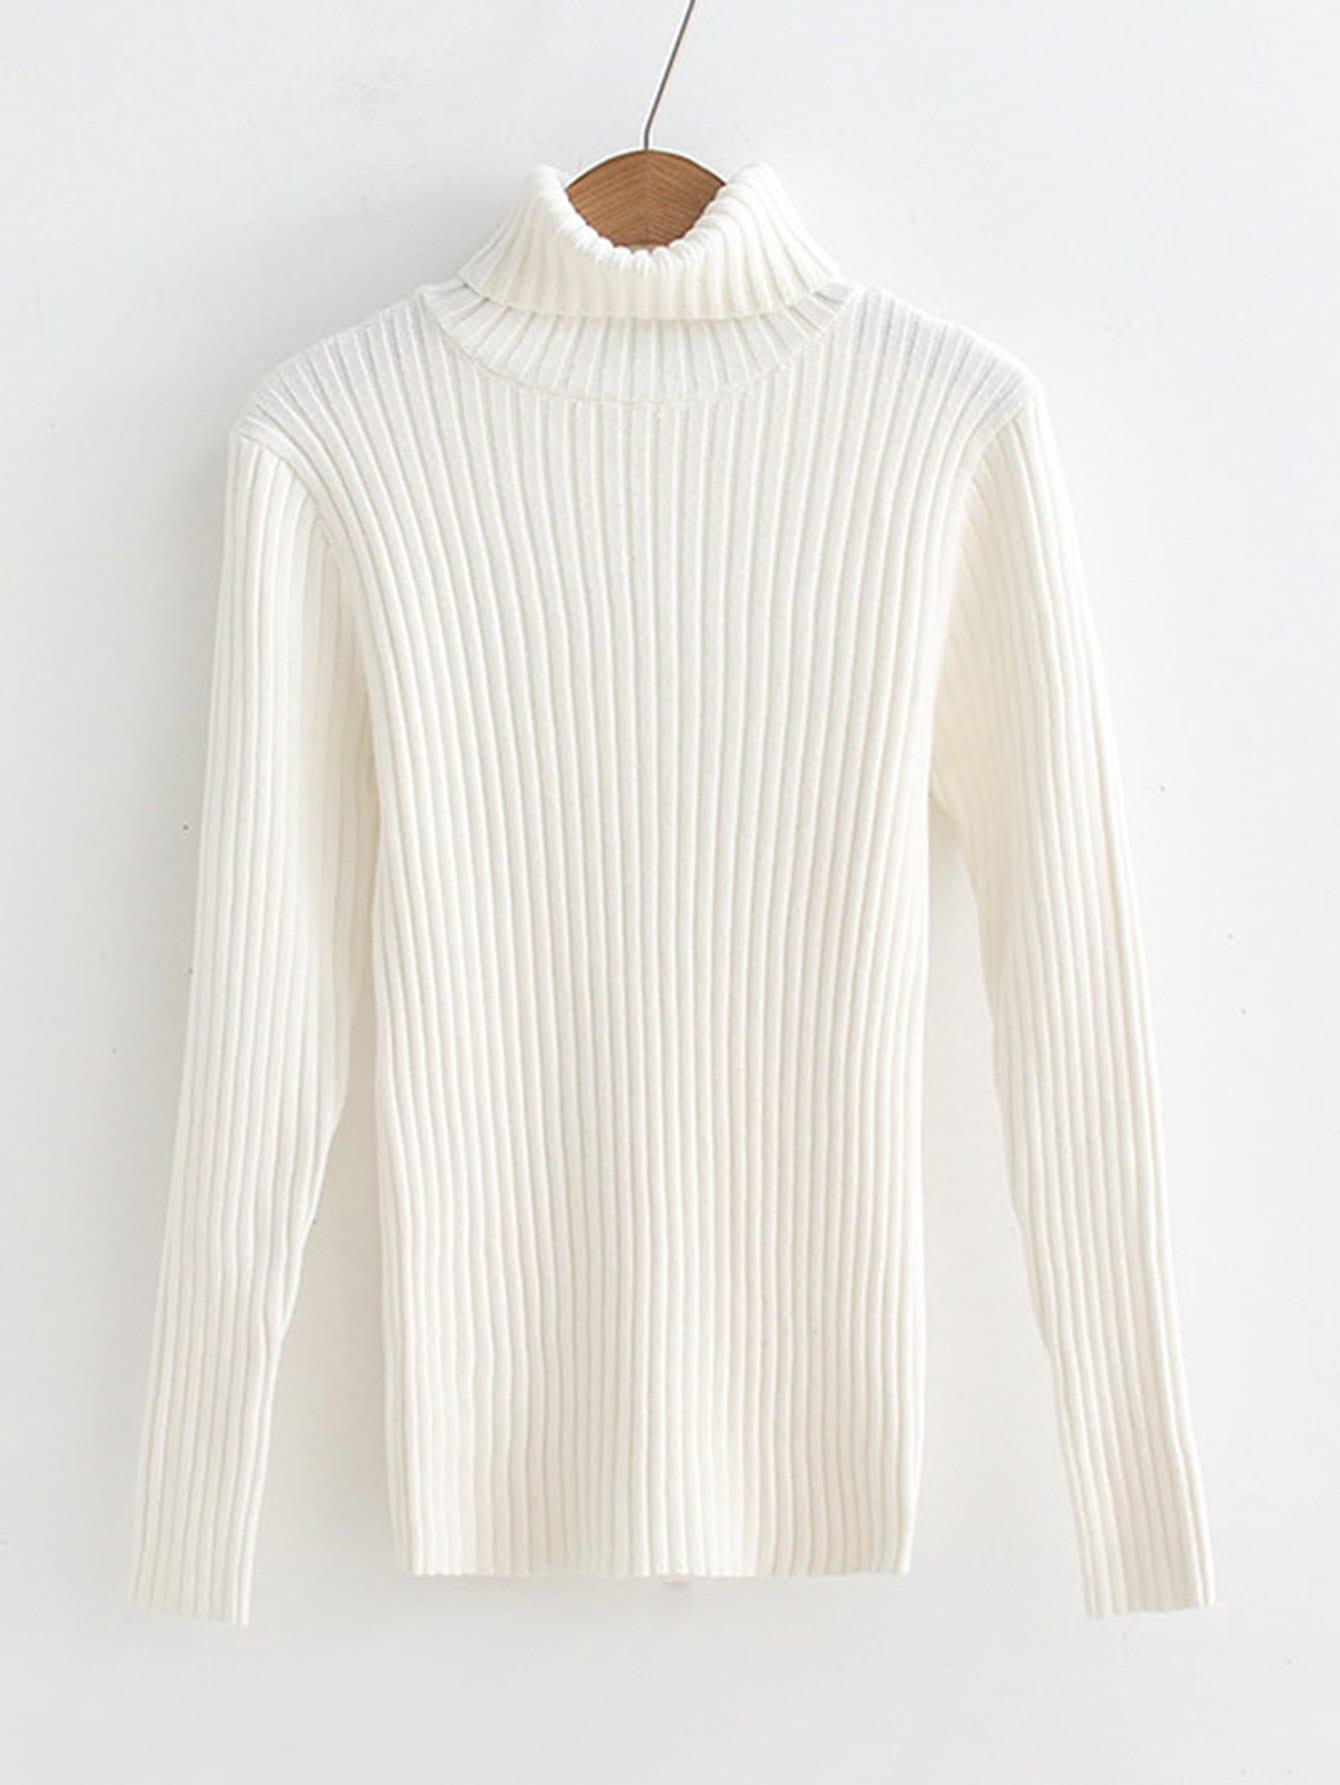 Rib Knit Turtleneck Slim Fit Sweater oversized turtleneck knit sweater